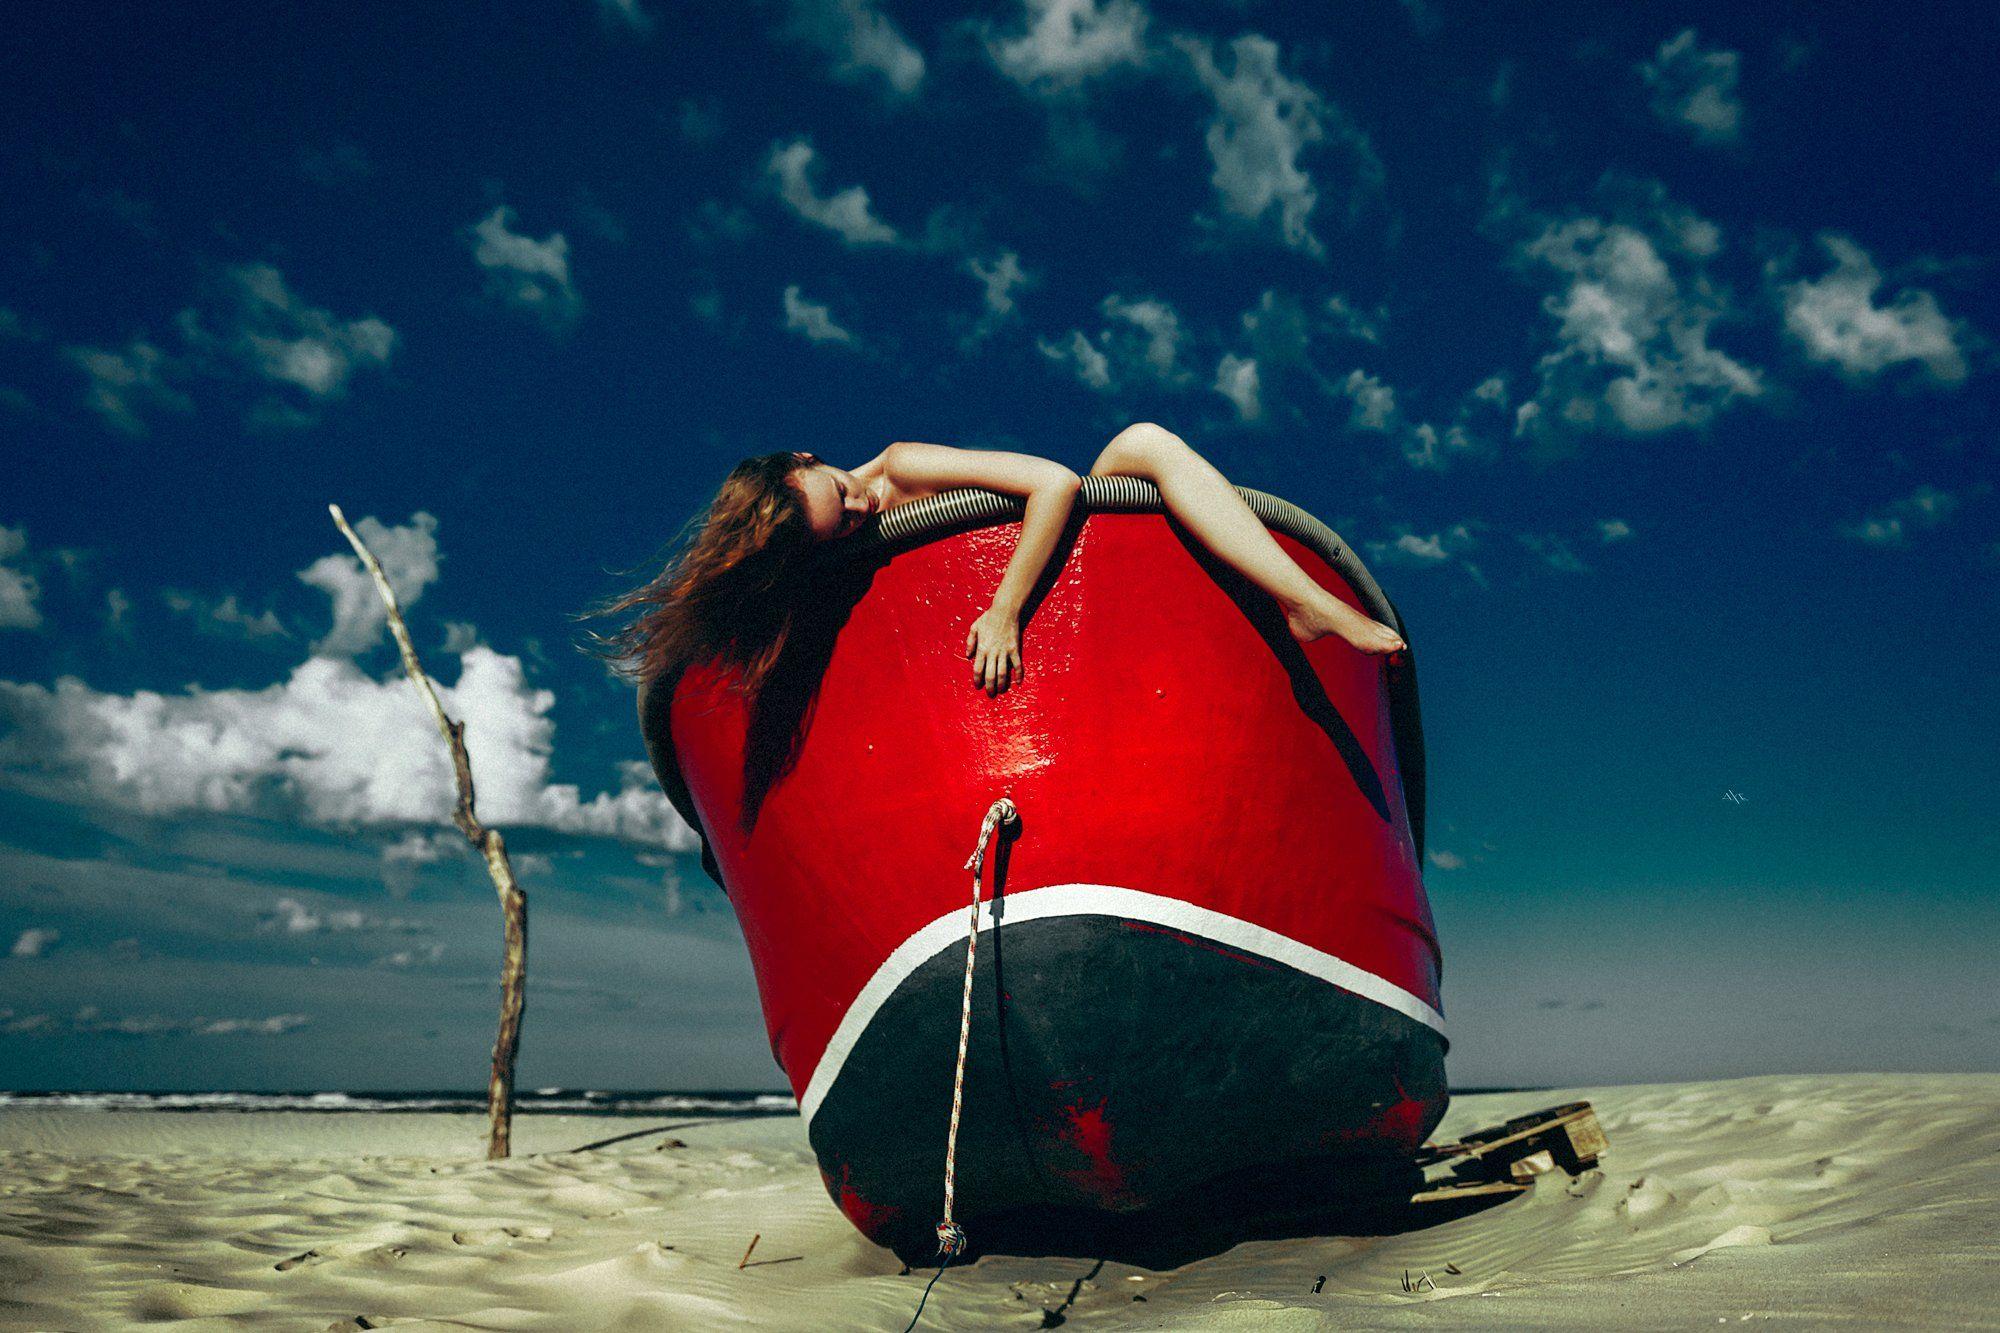 woman, portrait, boat, beach, art, conceptual, natural light, Руслан Болгов (Axe)